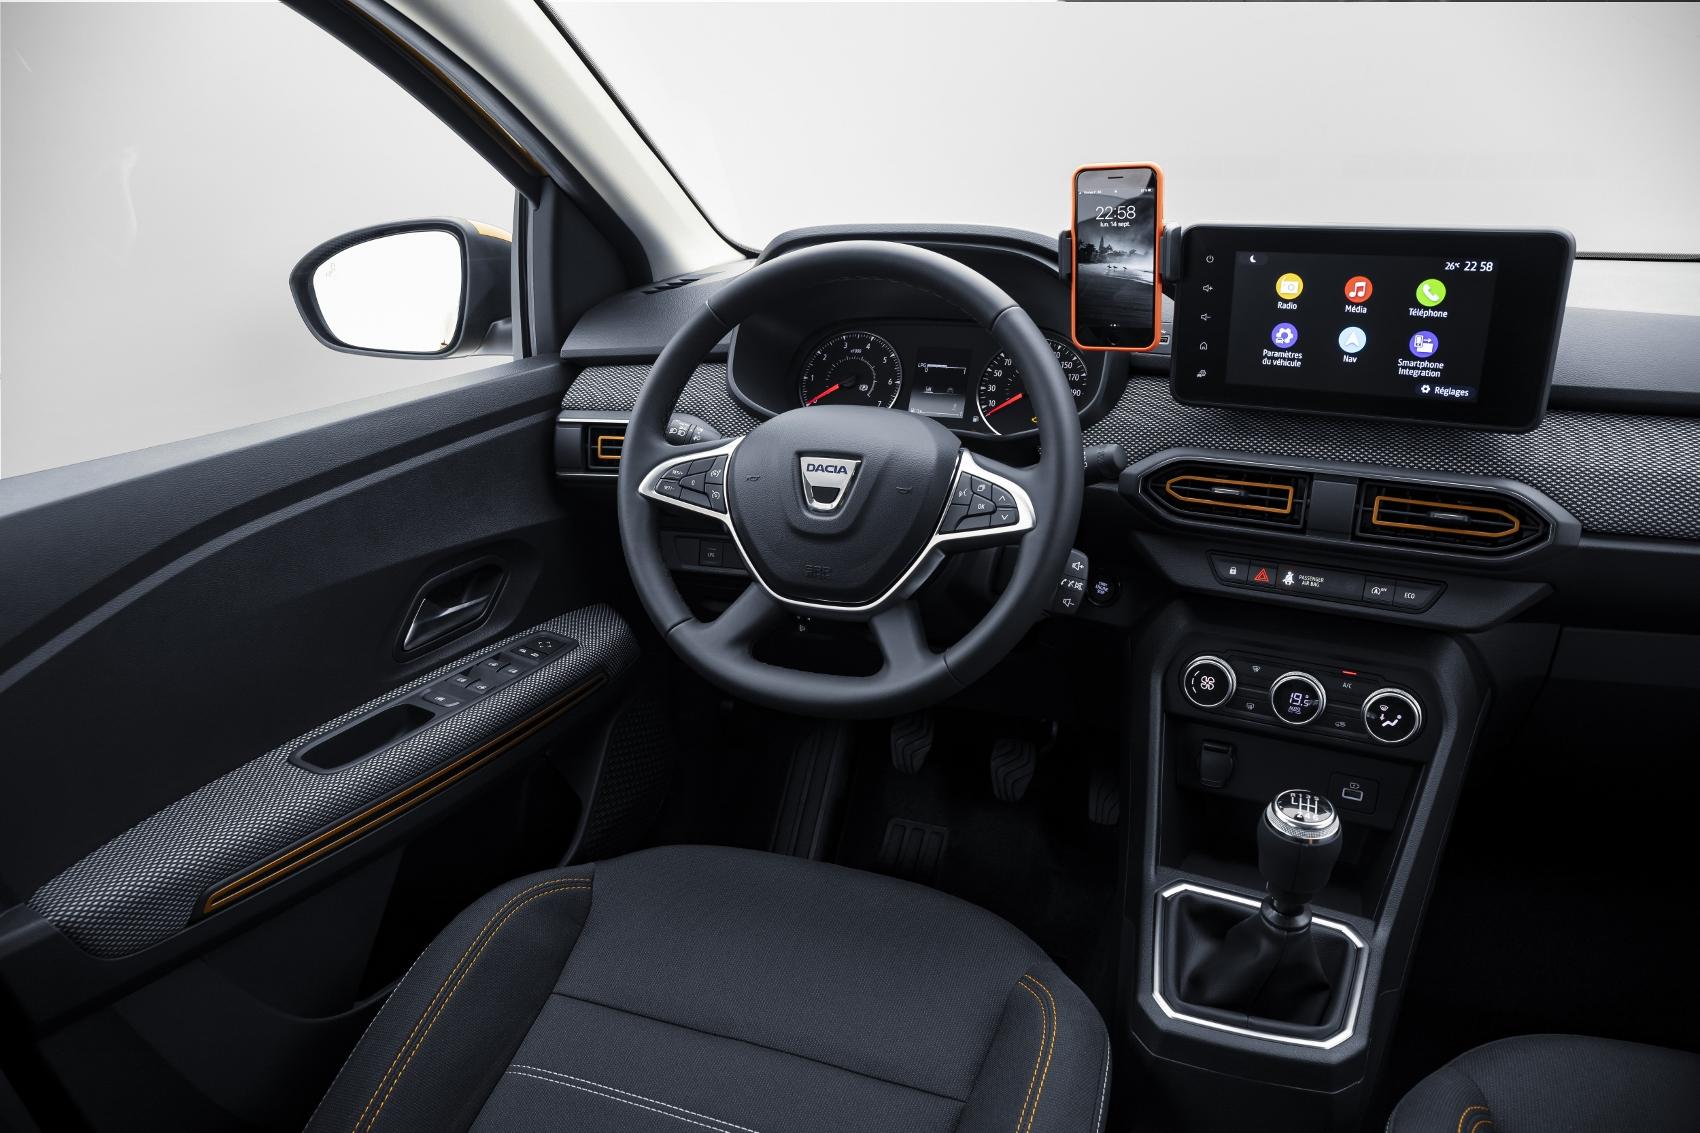 2020 - New Dacia SANDERO STEPWAY (9) (1700x1133)